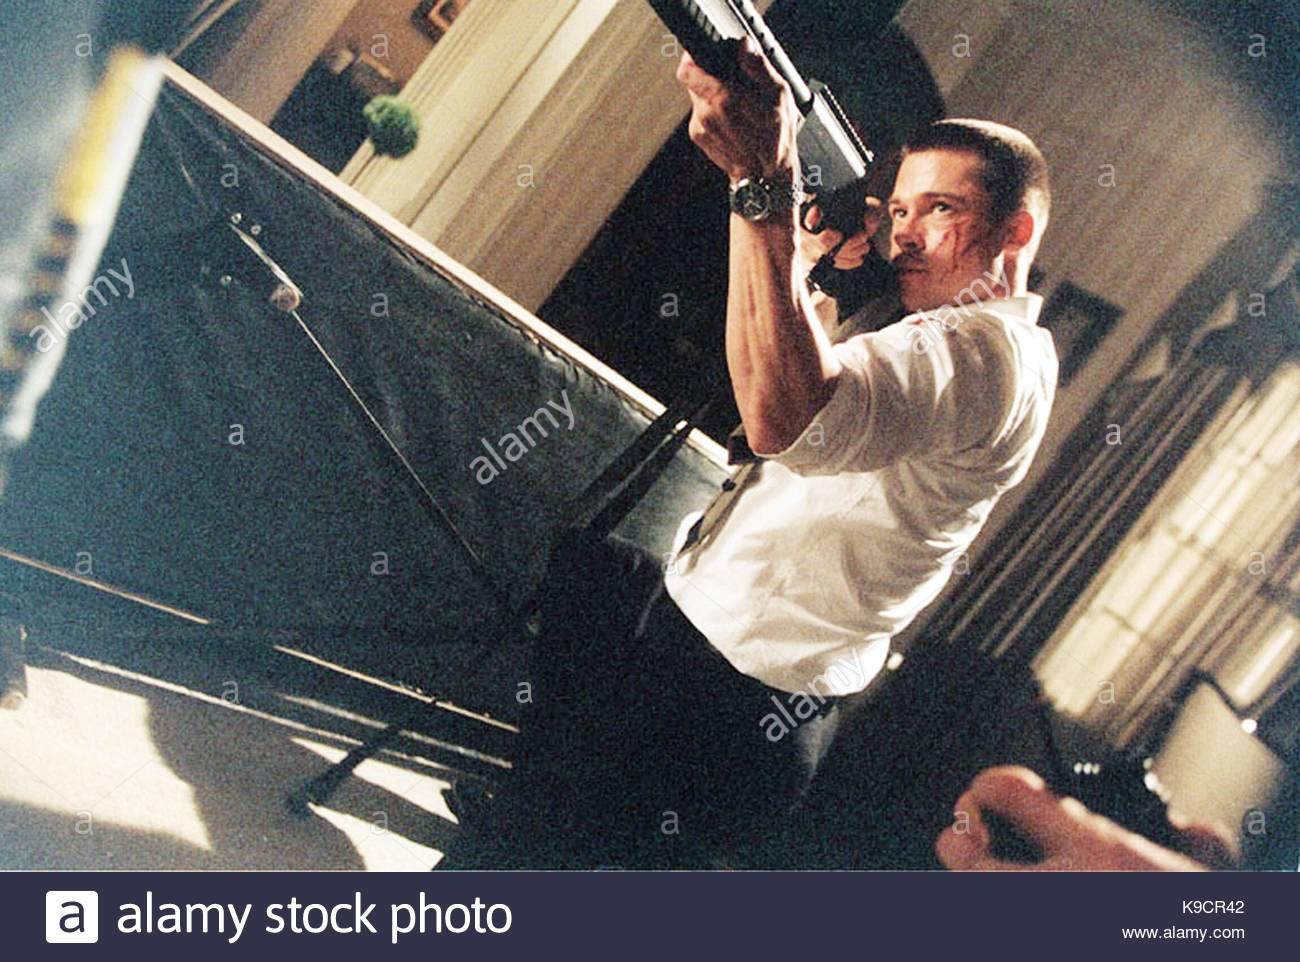 Brad pitt movie mr